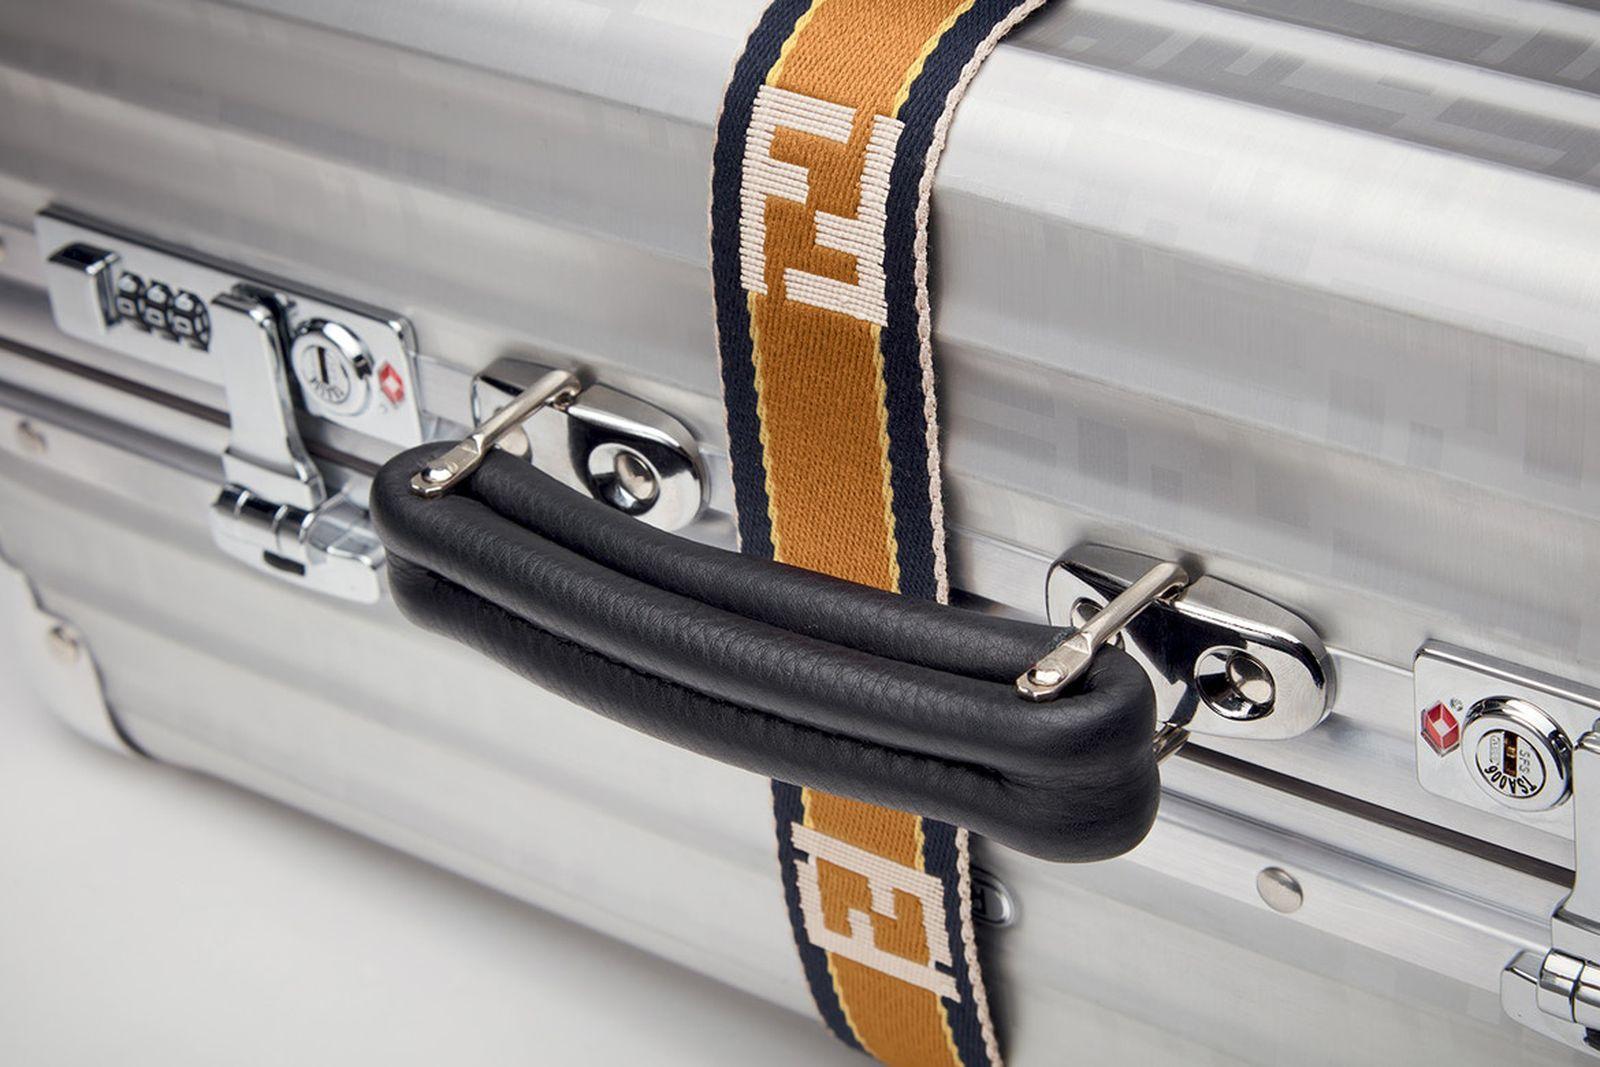 fendi rimowa luggage luggage bags